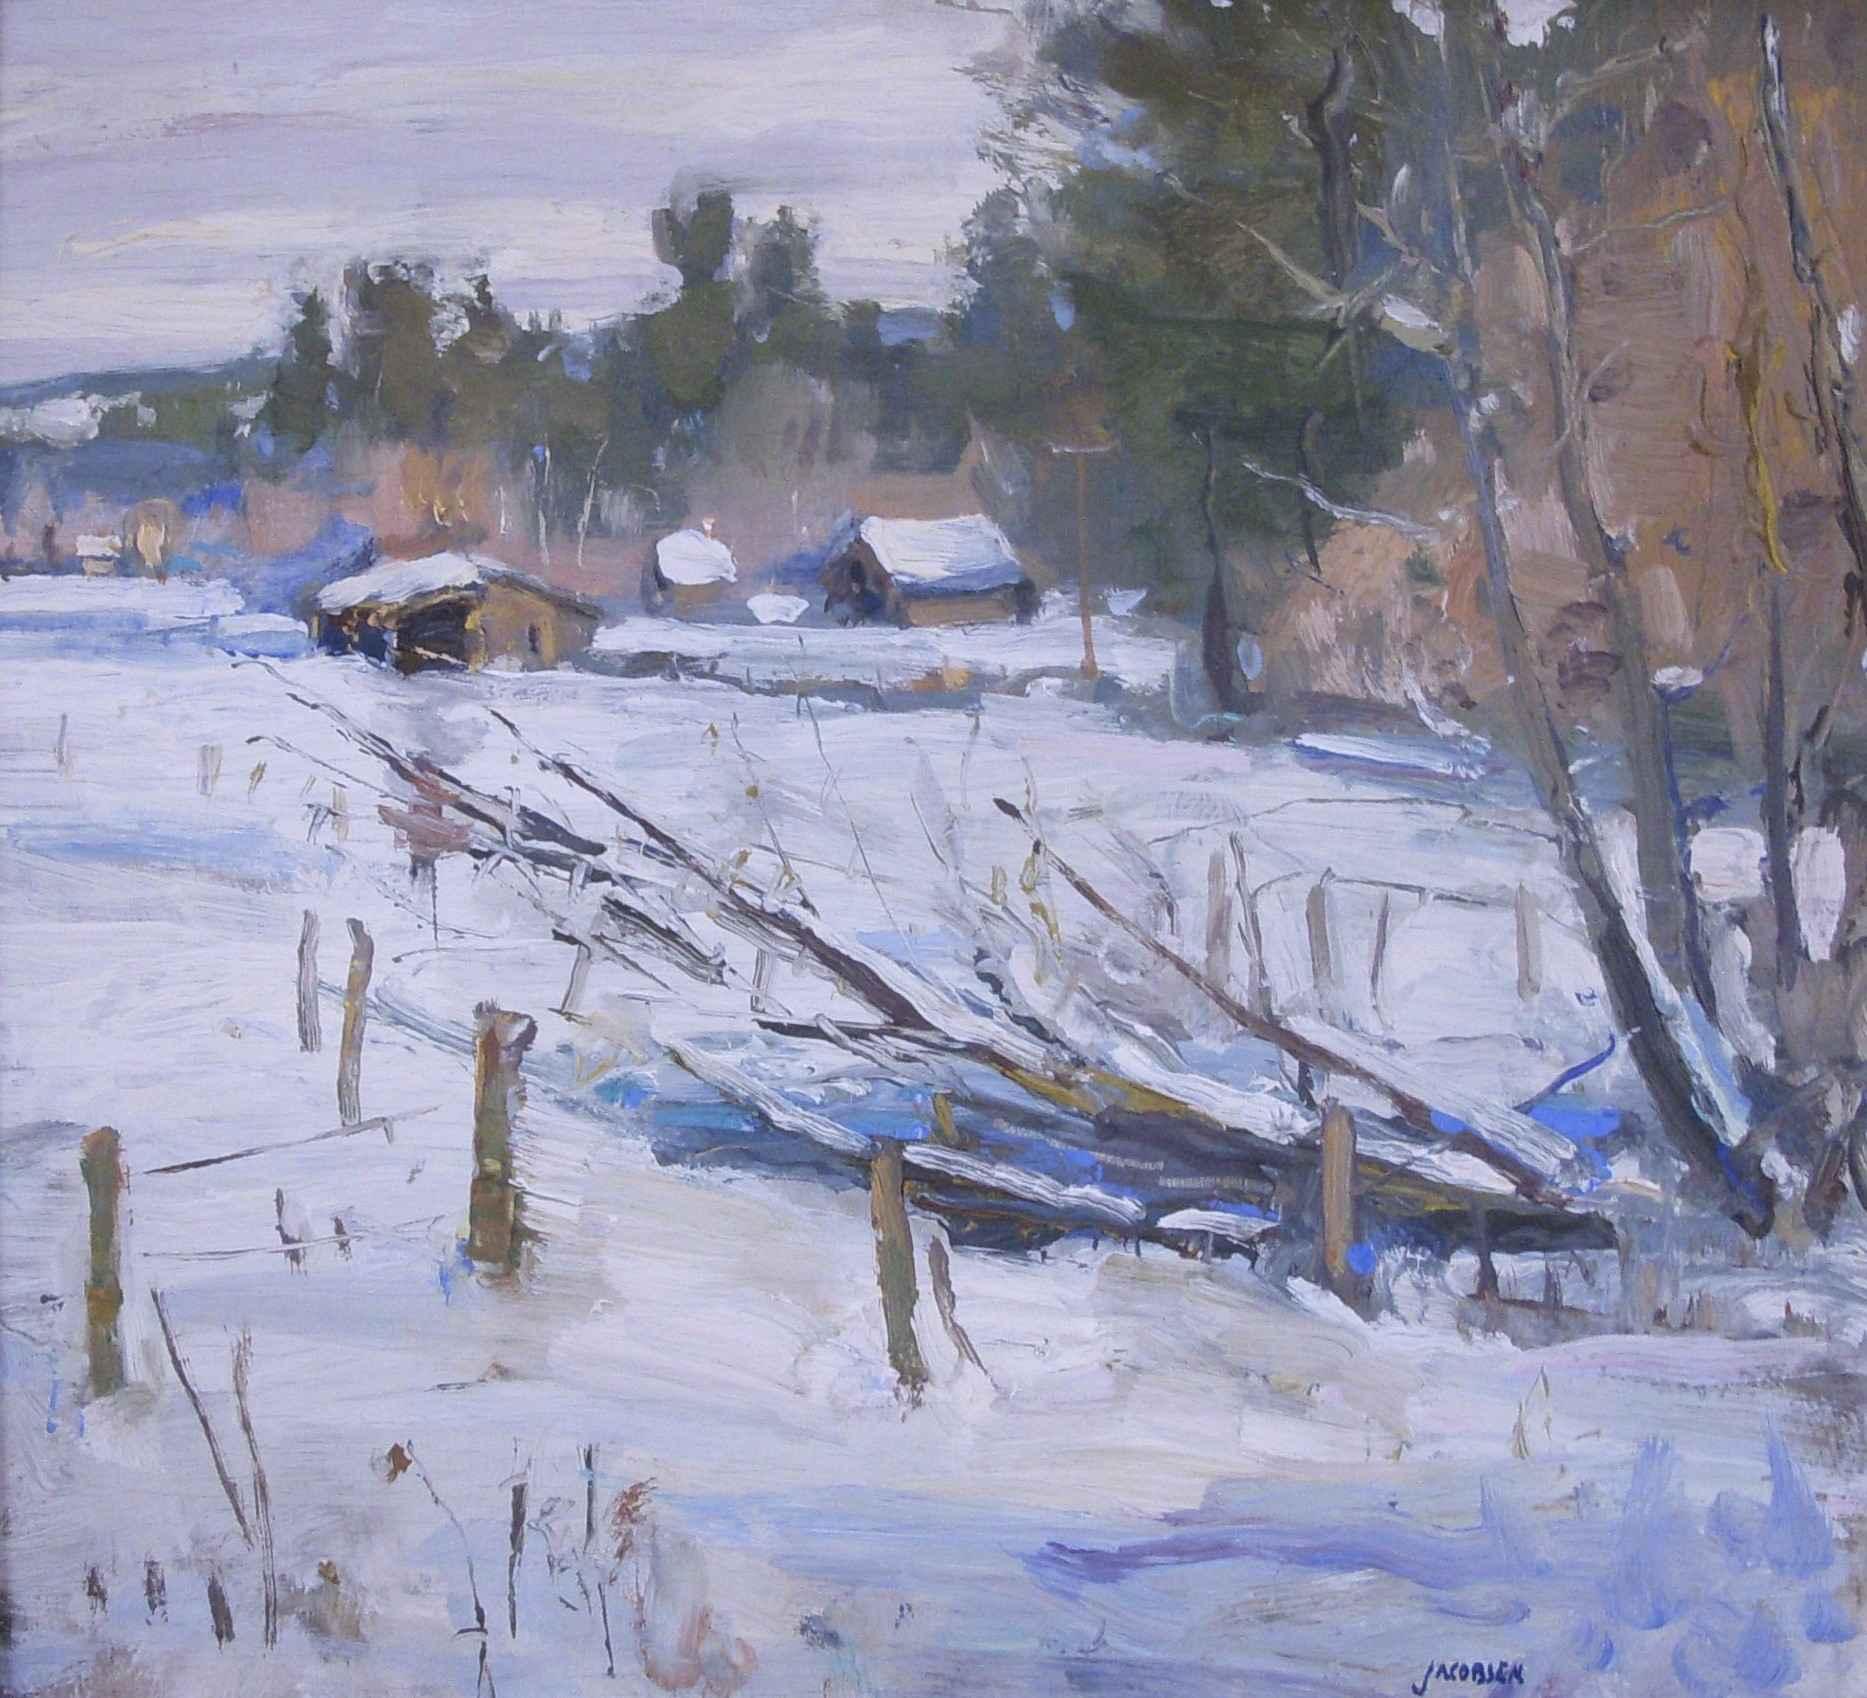 Winter Landscape by  Eric Jacobsen - Masterpiece Online